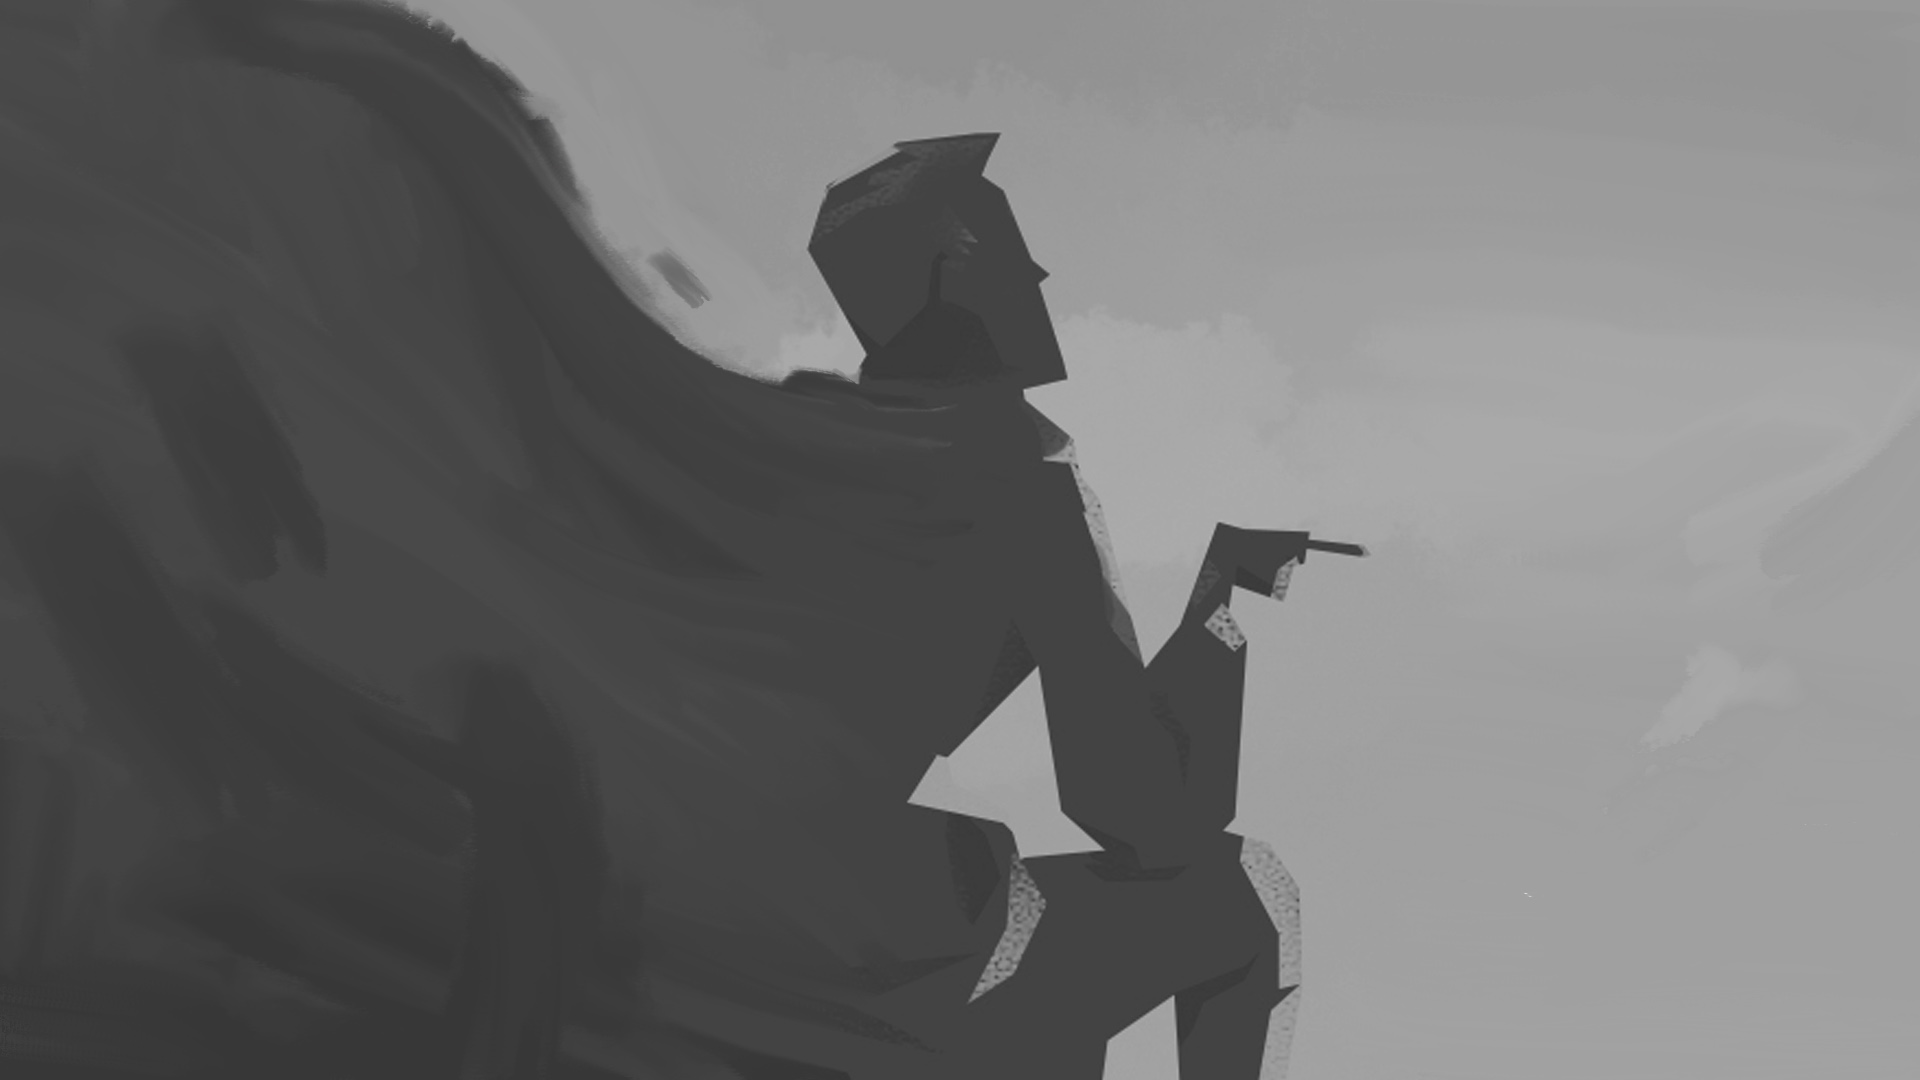 smoker banner black and white for illustration mix